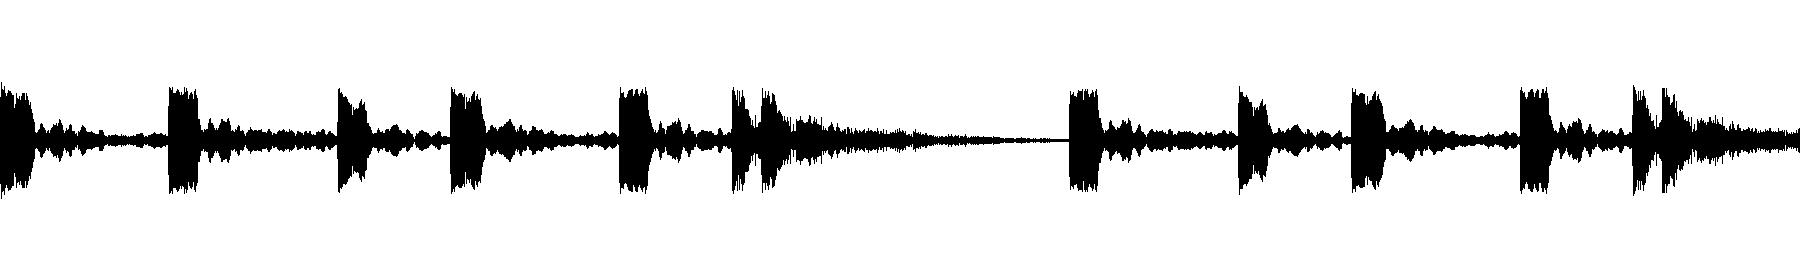 pth synth 25